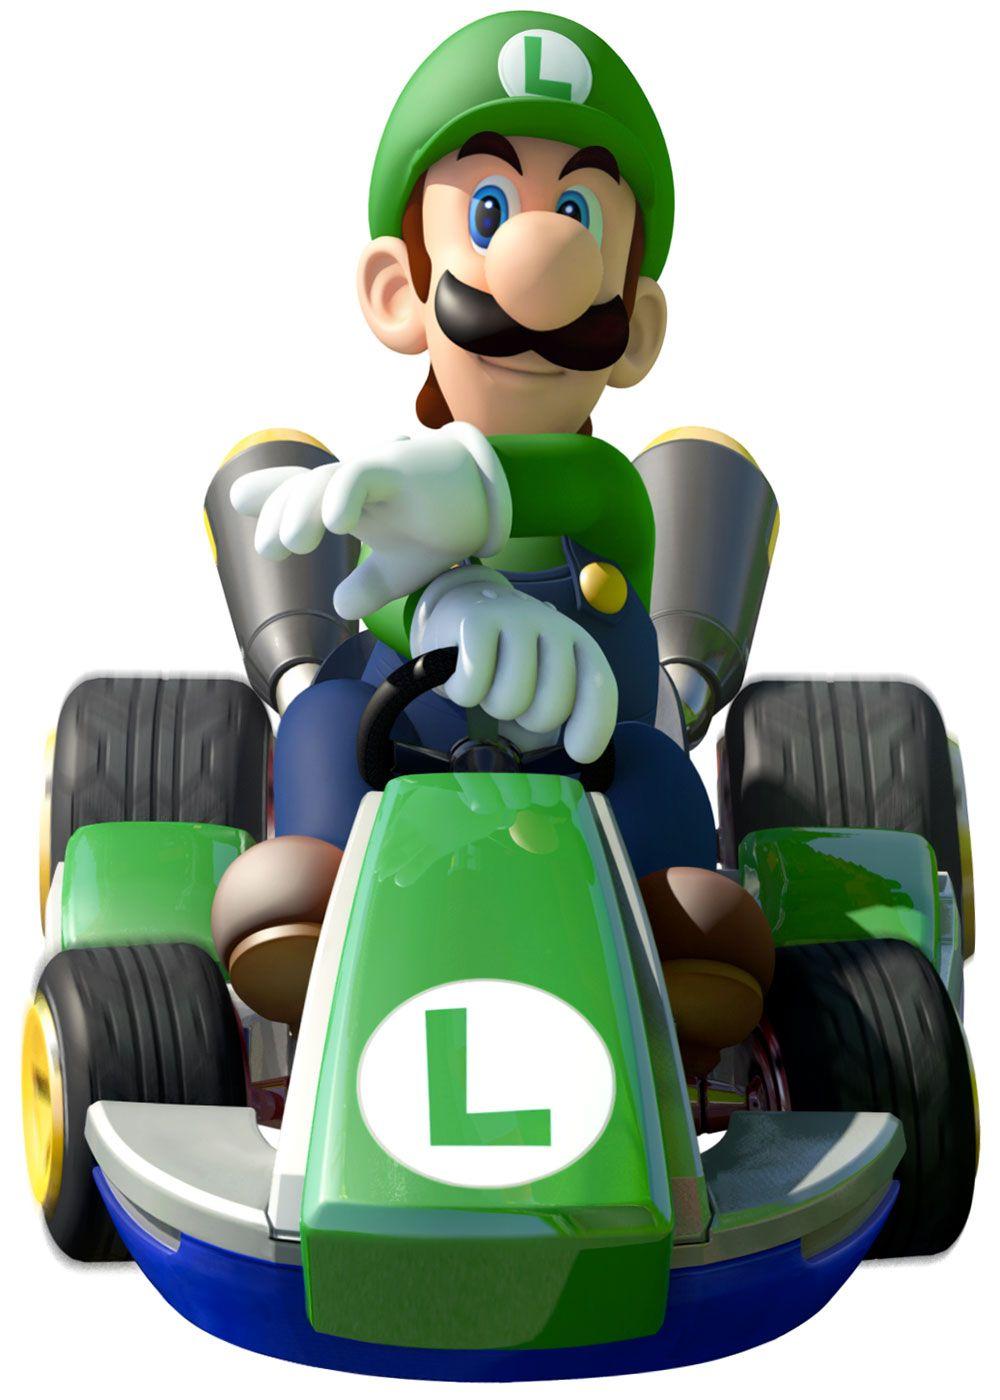 Pin By Natalie Bria On Ogam Mario Kart Mario Kart Characters Mario Kart 8